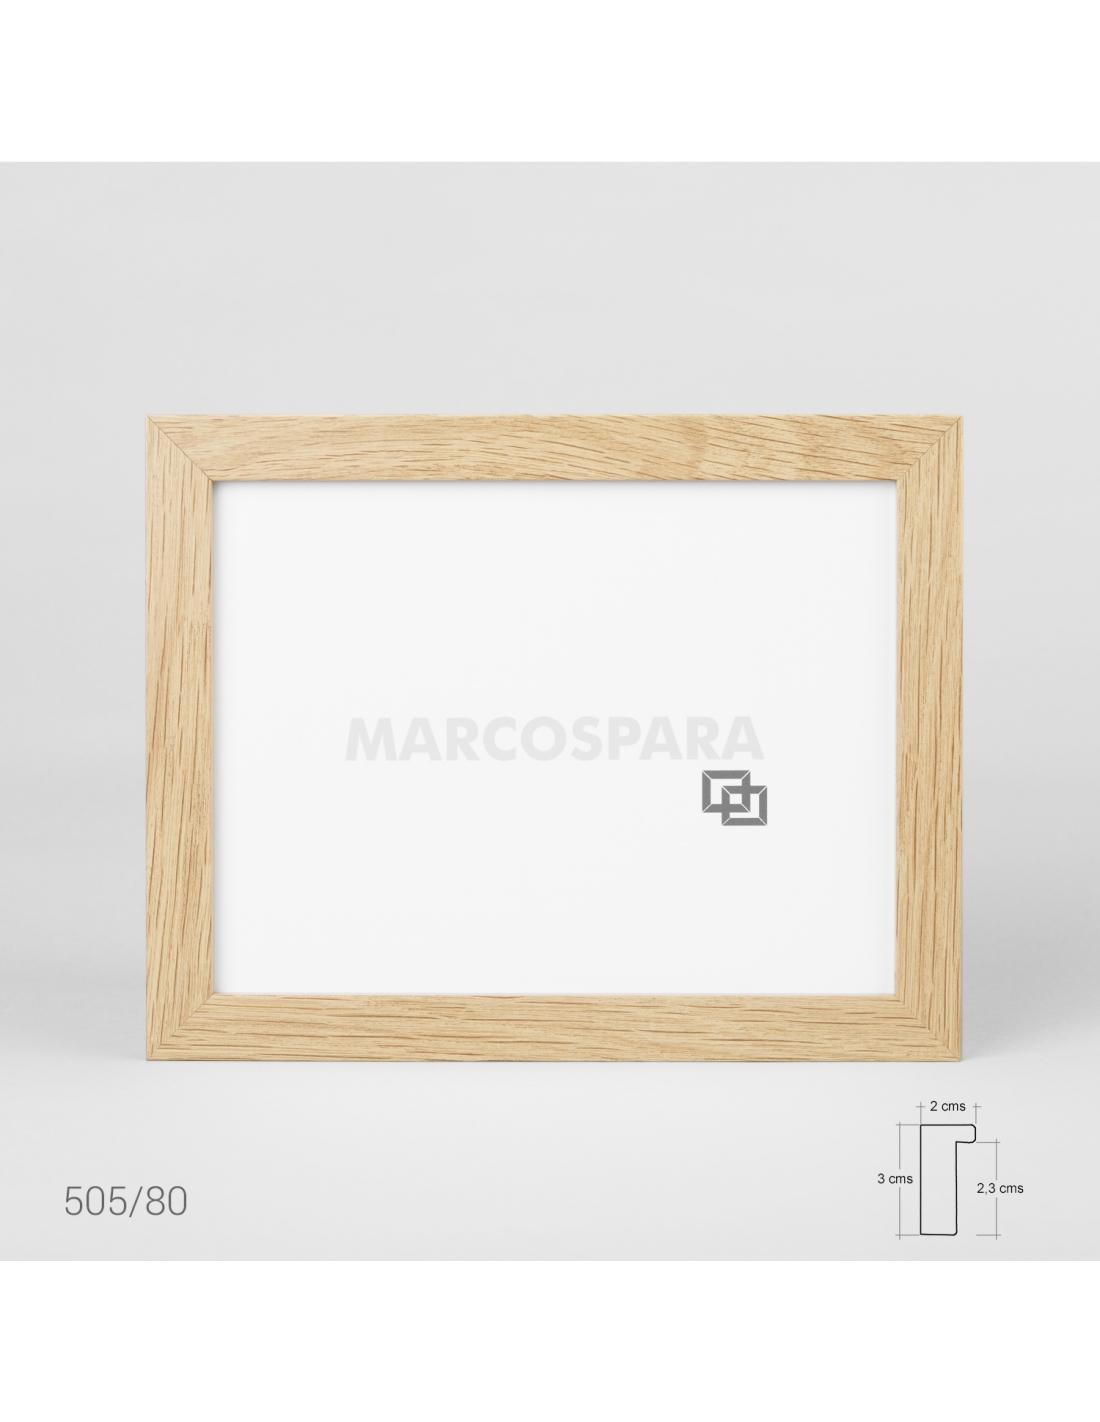 Marco de madera para Fotos M505